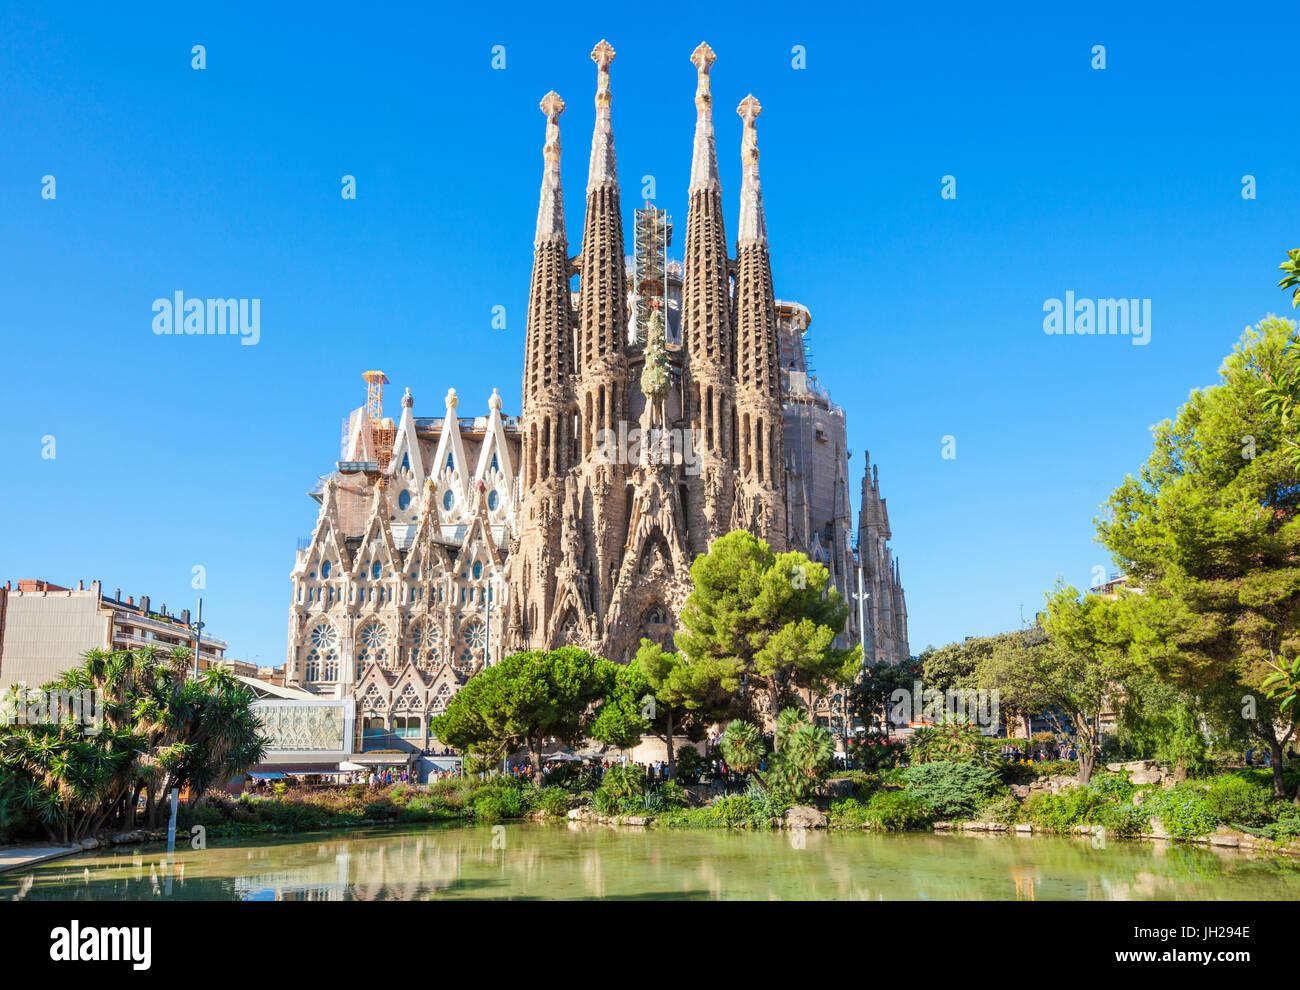 La iglesia de La Sagrada Familia vista frontal, diseñado por Antoni Gaudí, UNESCO, Barcelona, Cataluña Imagen De Stock